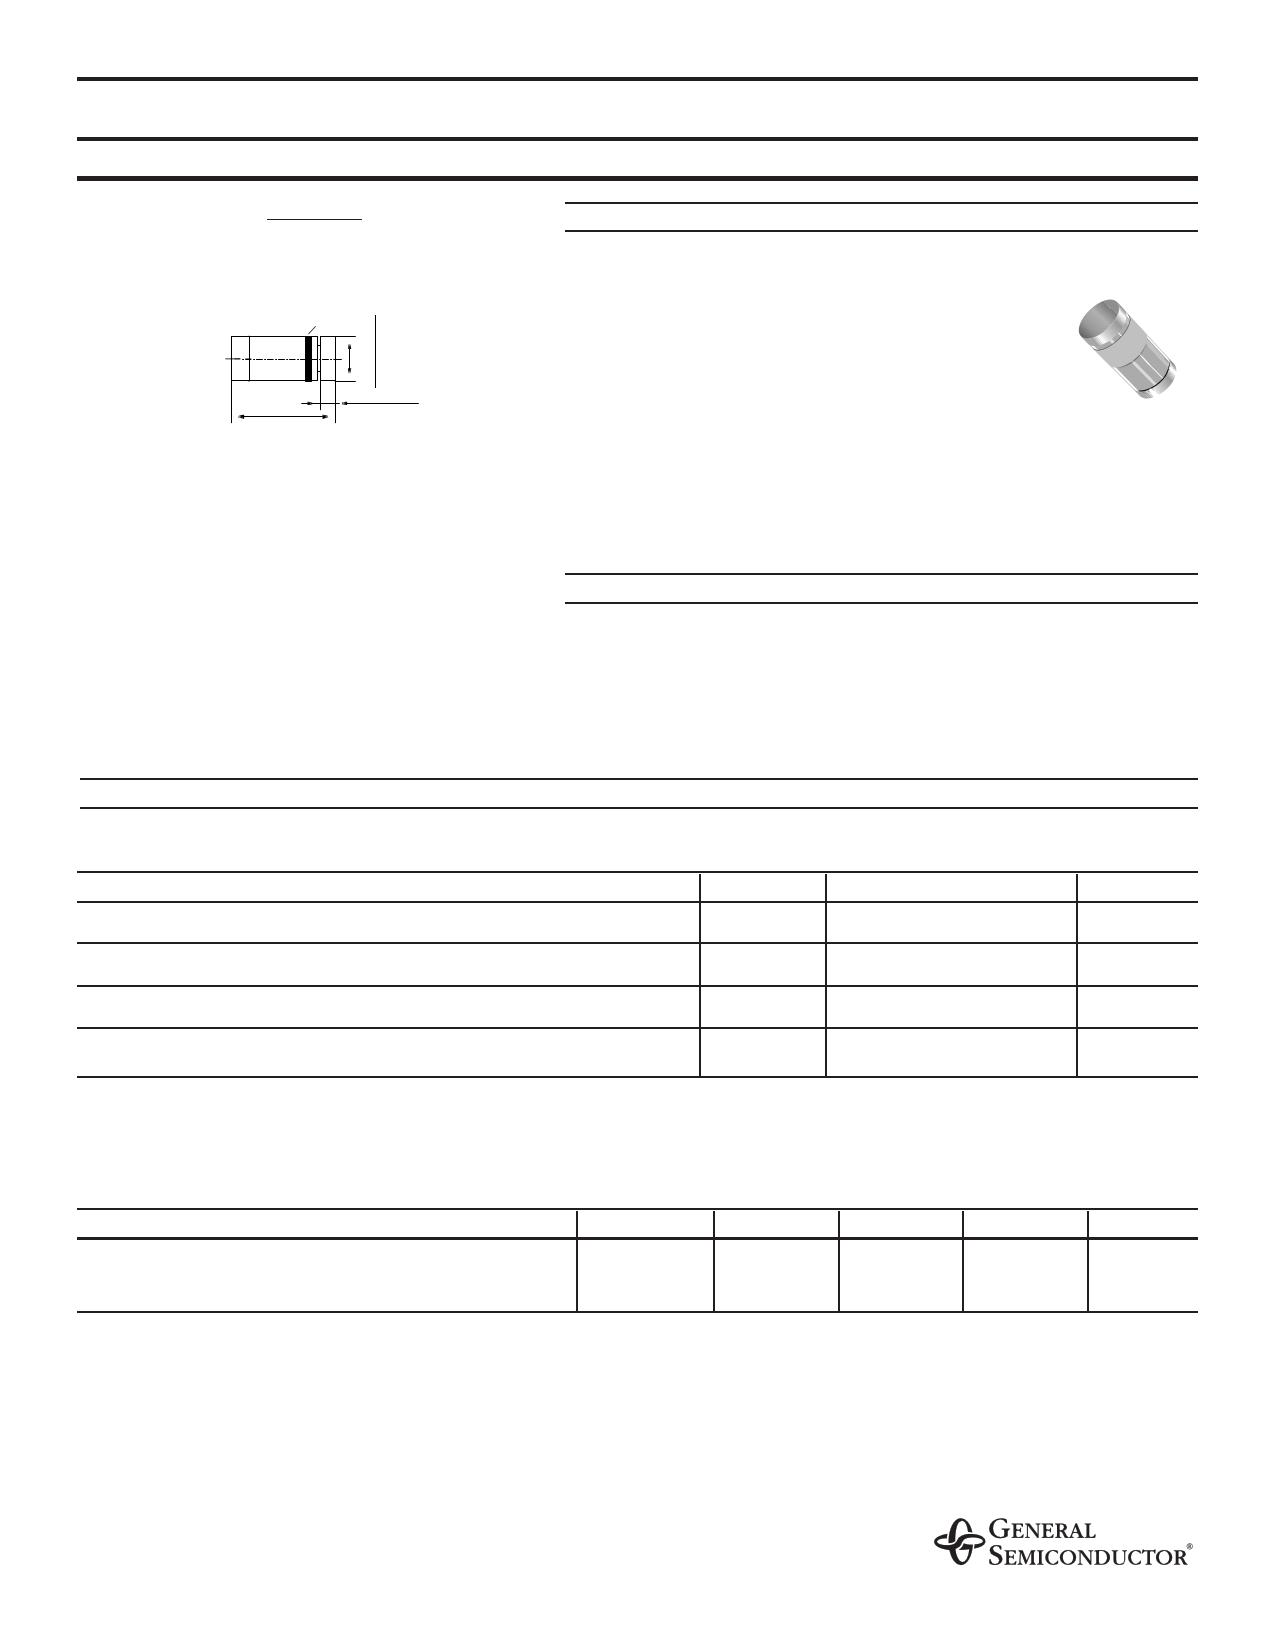 ZMM4.3 datasheet